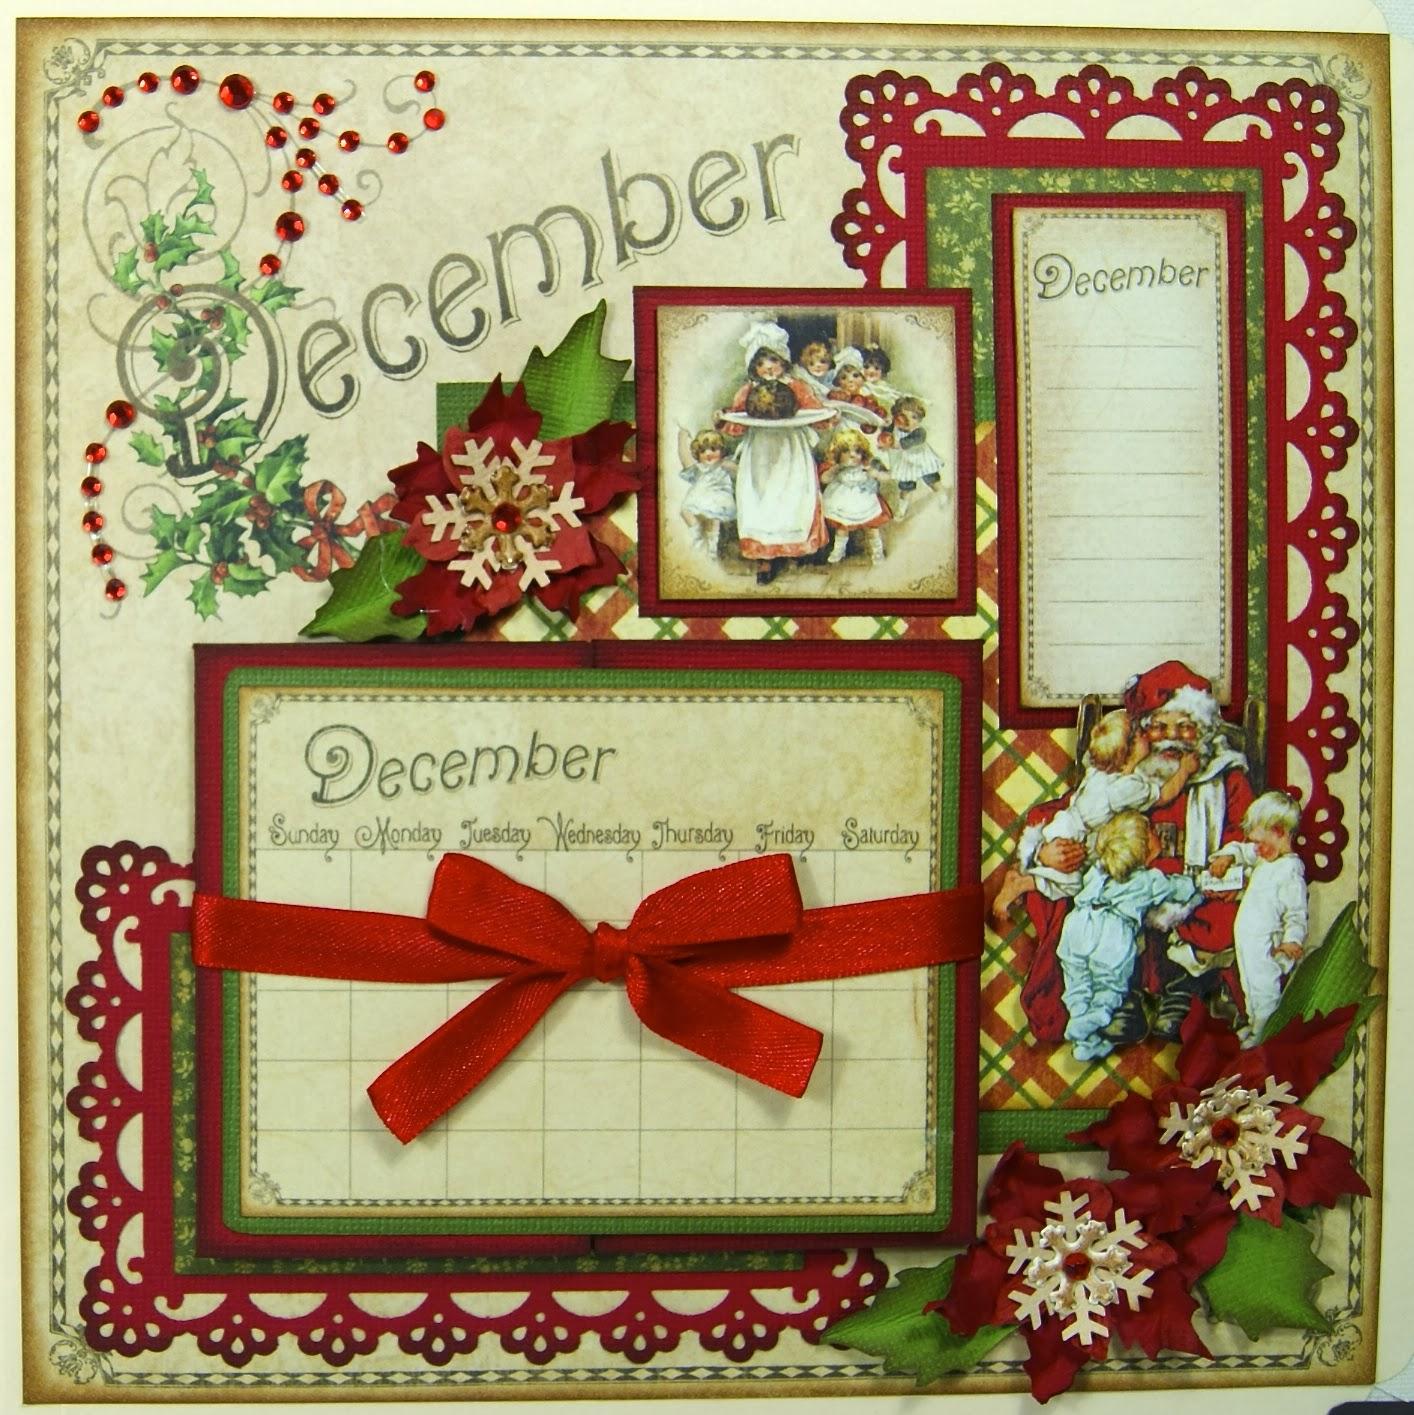 Scrapbook ideas christmas card - Scrapbook Ideas Christmas Card 84